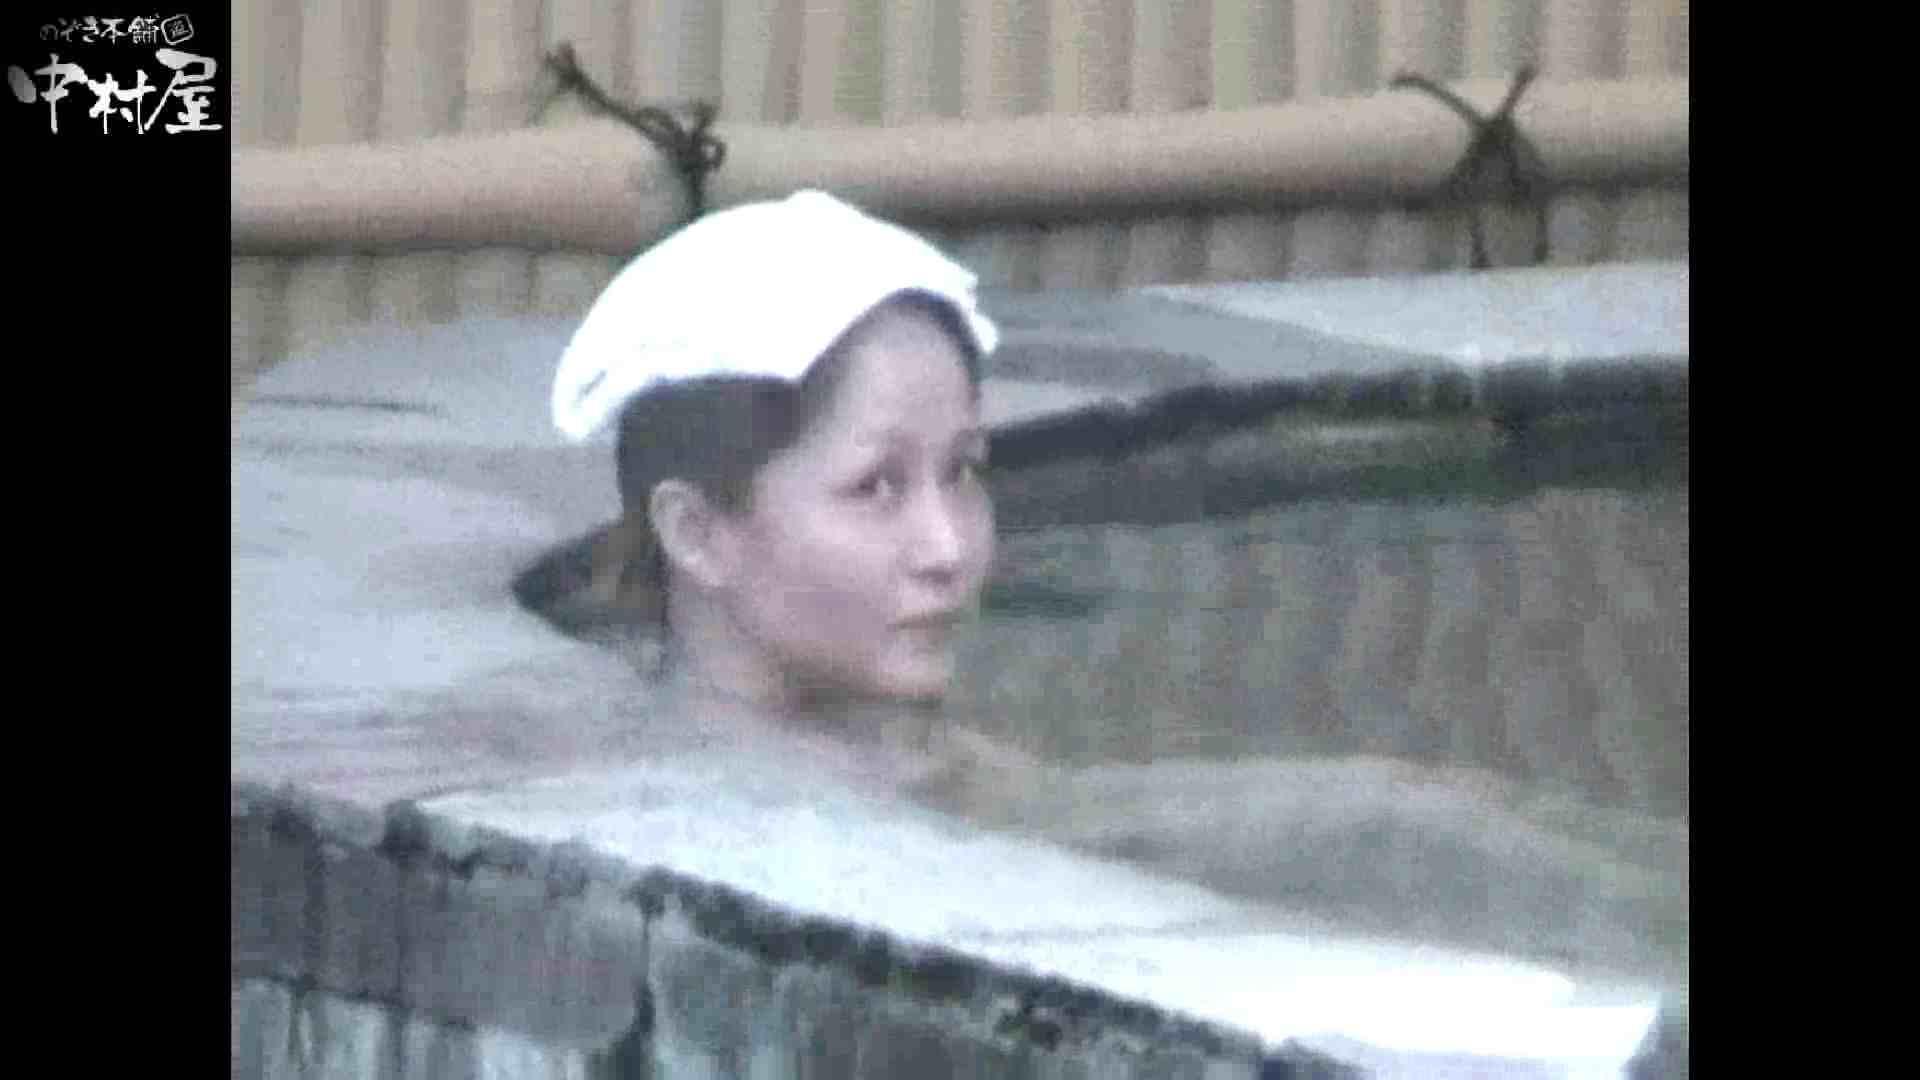 Aquaな露天風呂Vol.880潜入盗撮露天風呂十六判湯 其の六 露天 | 潜入シリーズ  95pic 58